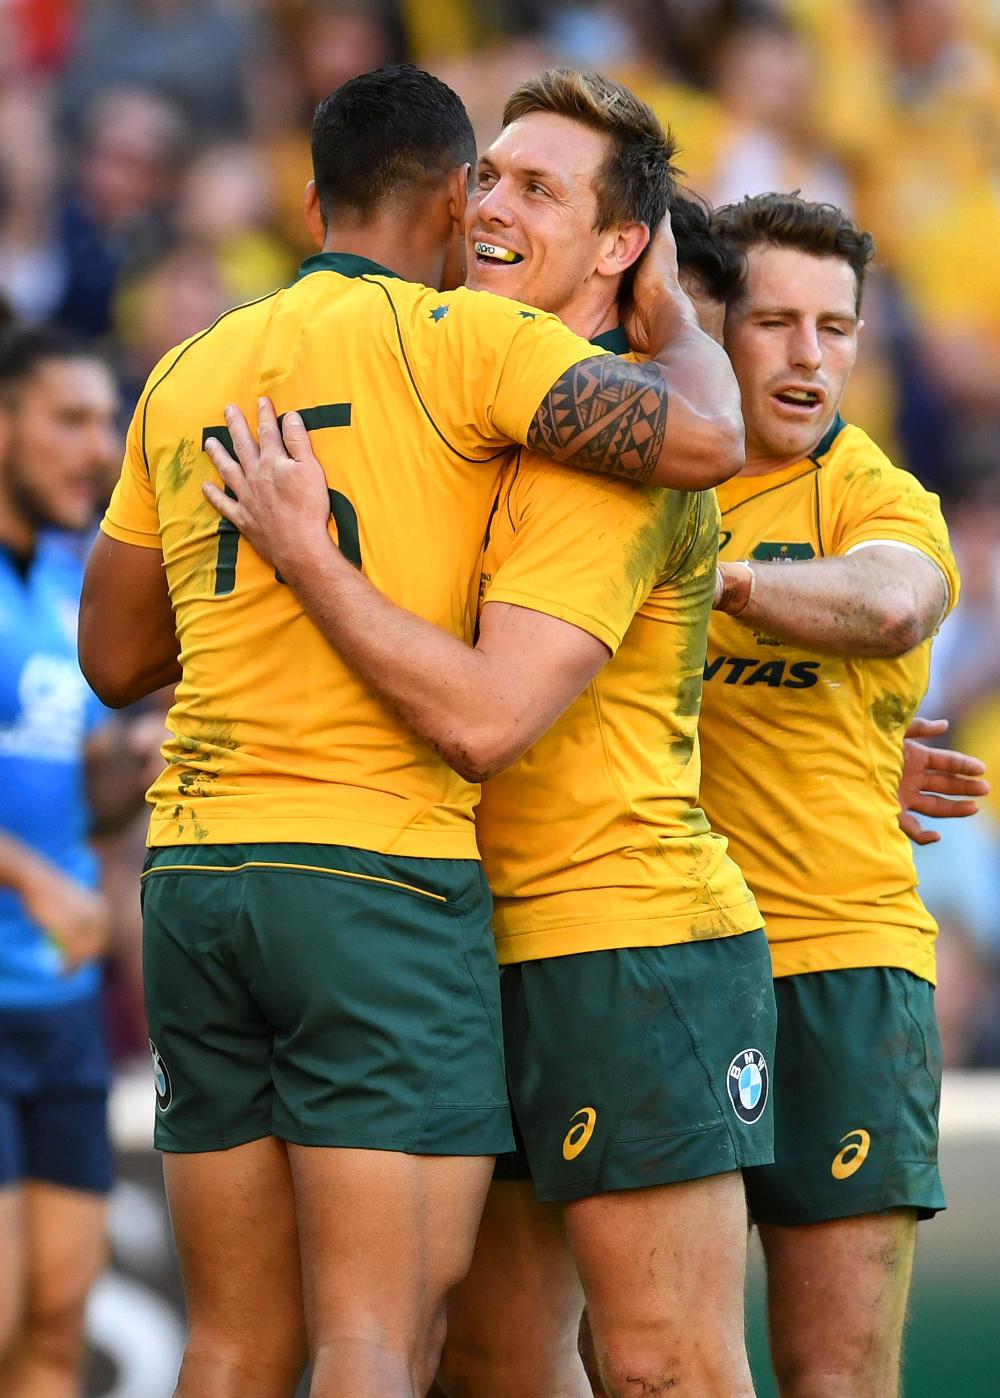 Dane Haylett-Petty Wallabies Australia Rugby Union 2017 tall